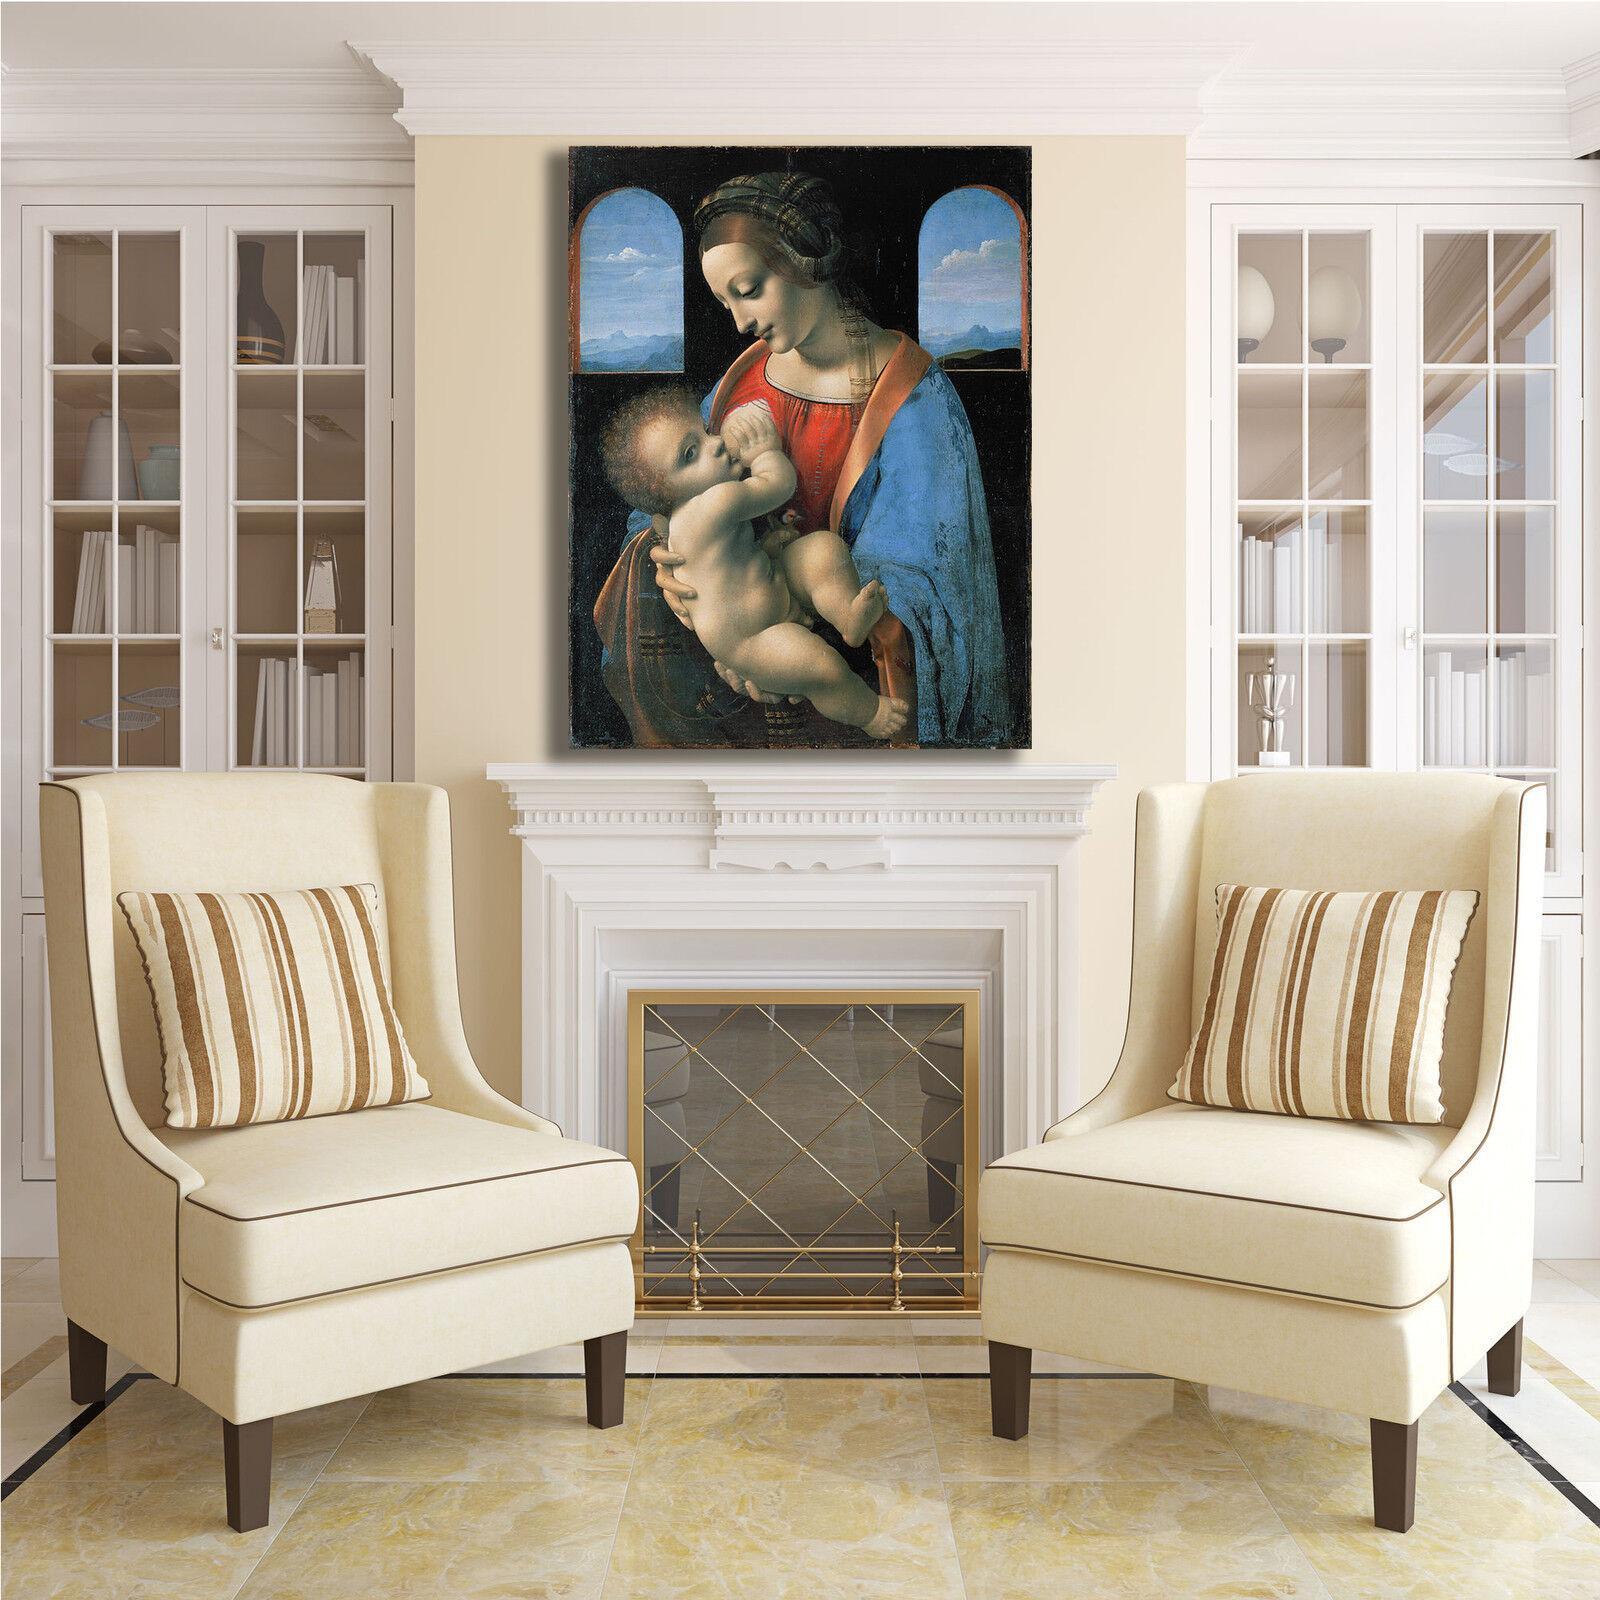 Da Vinci dipinto Madonna Litta design quadro stampa tela dipinto Vinci telaio arrossoo casa 455ff6